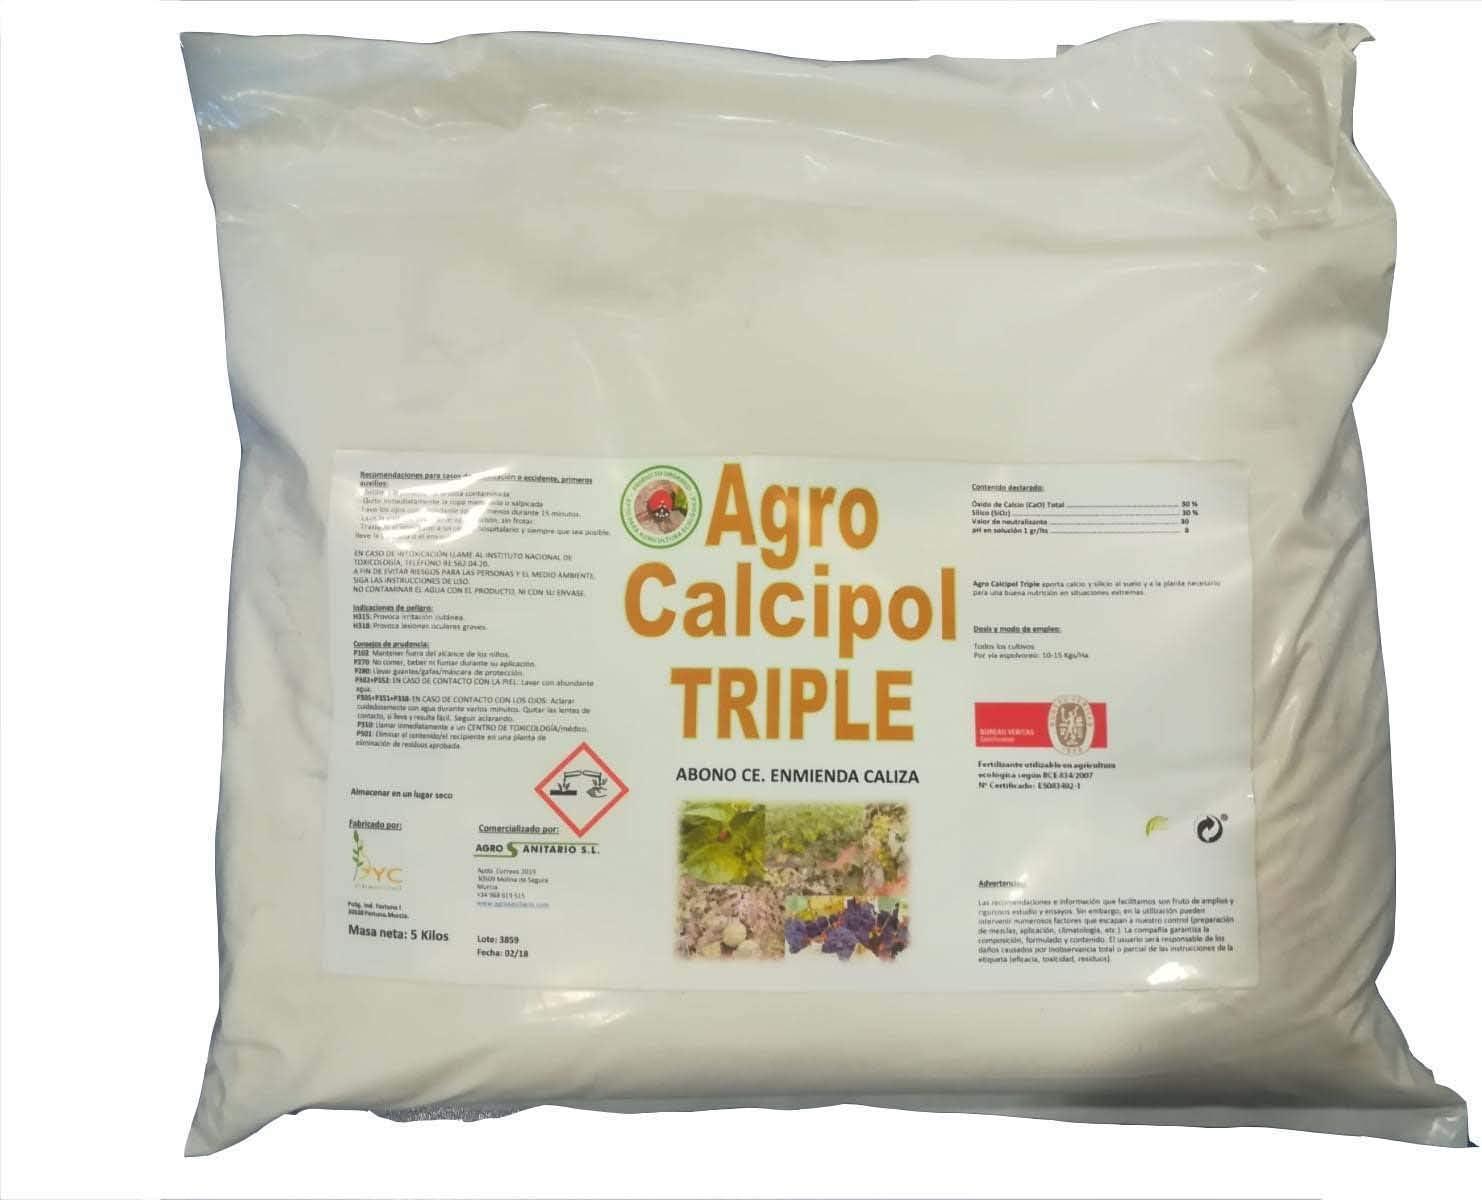 Agro Calcipol Triple (5 Kg). Insecticida - Fungicida. Ecológico